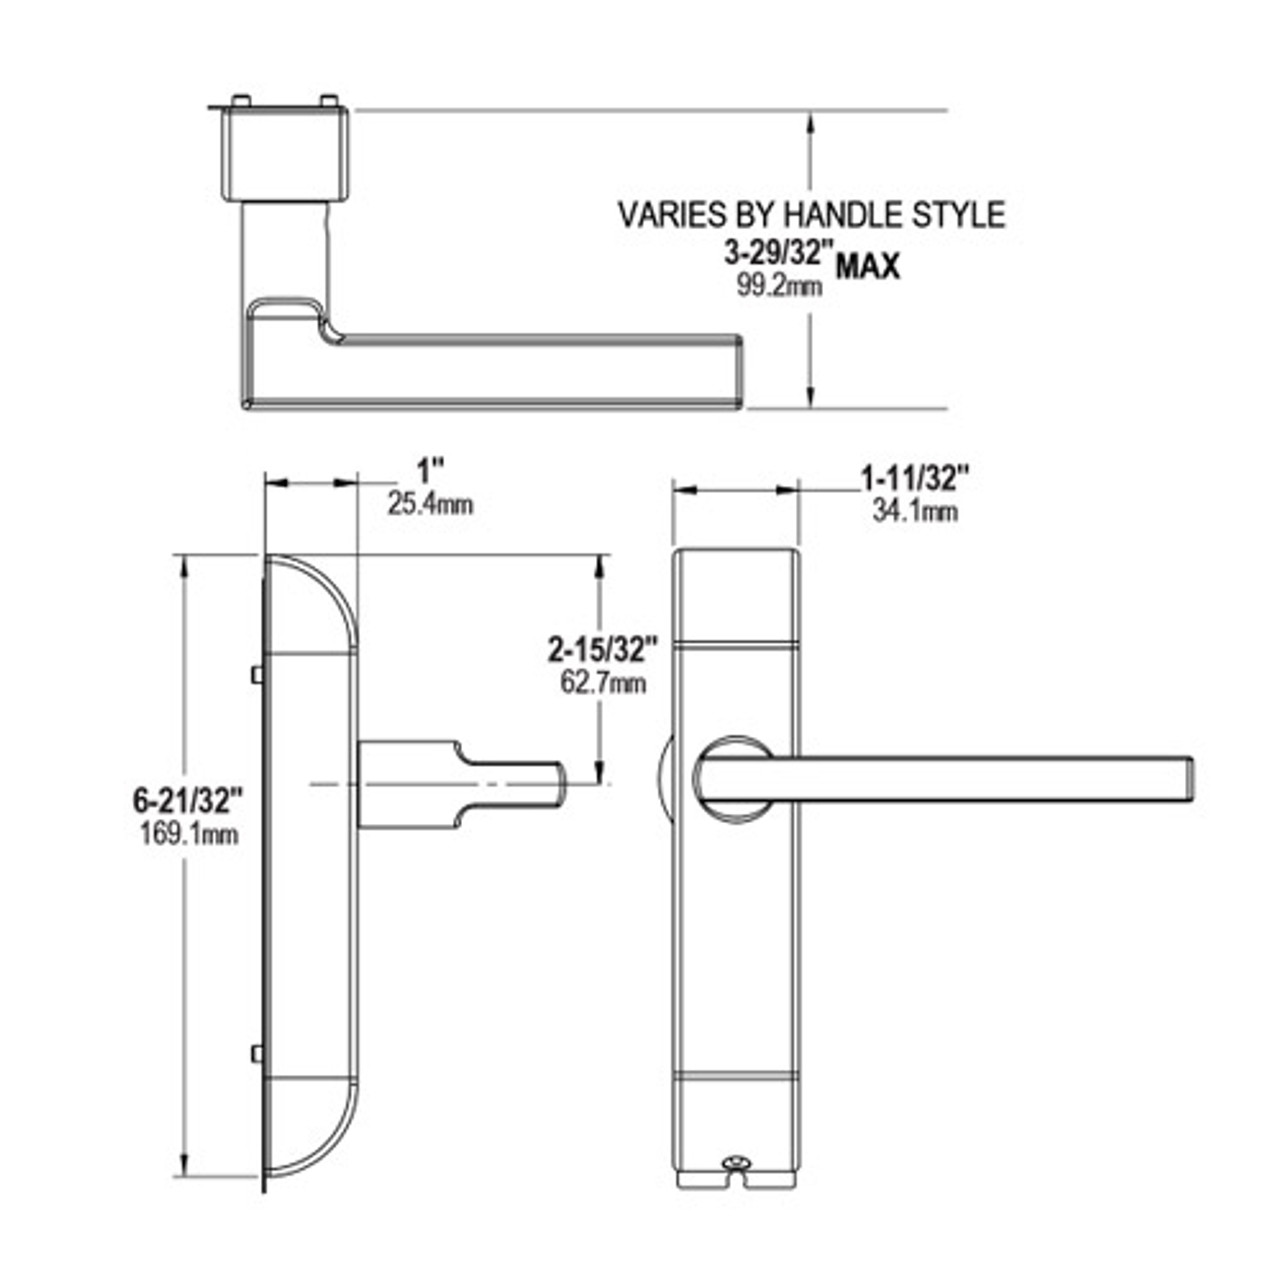 4600M-MW-641-US3 Adams Rite MW Designer handle Dimensional View